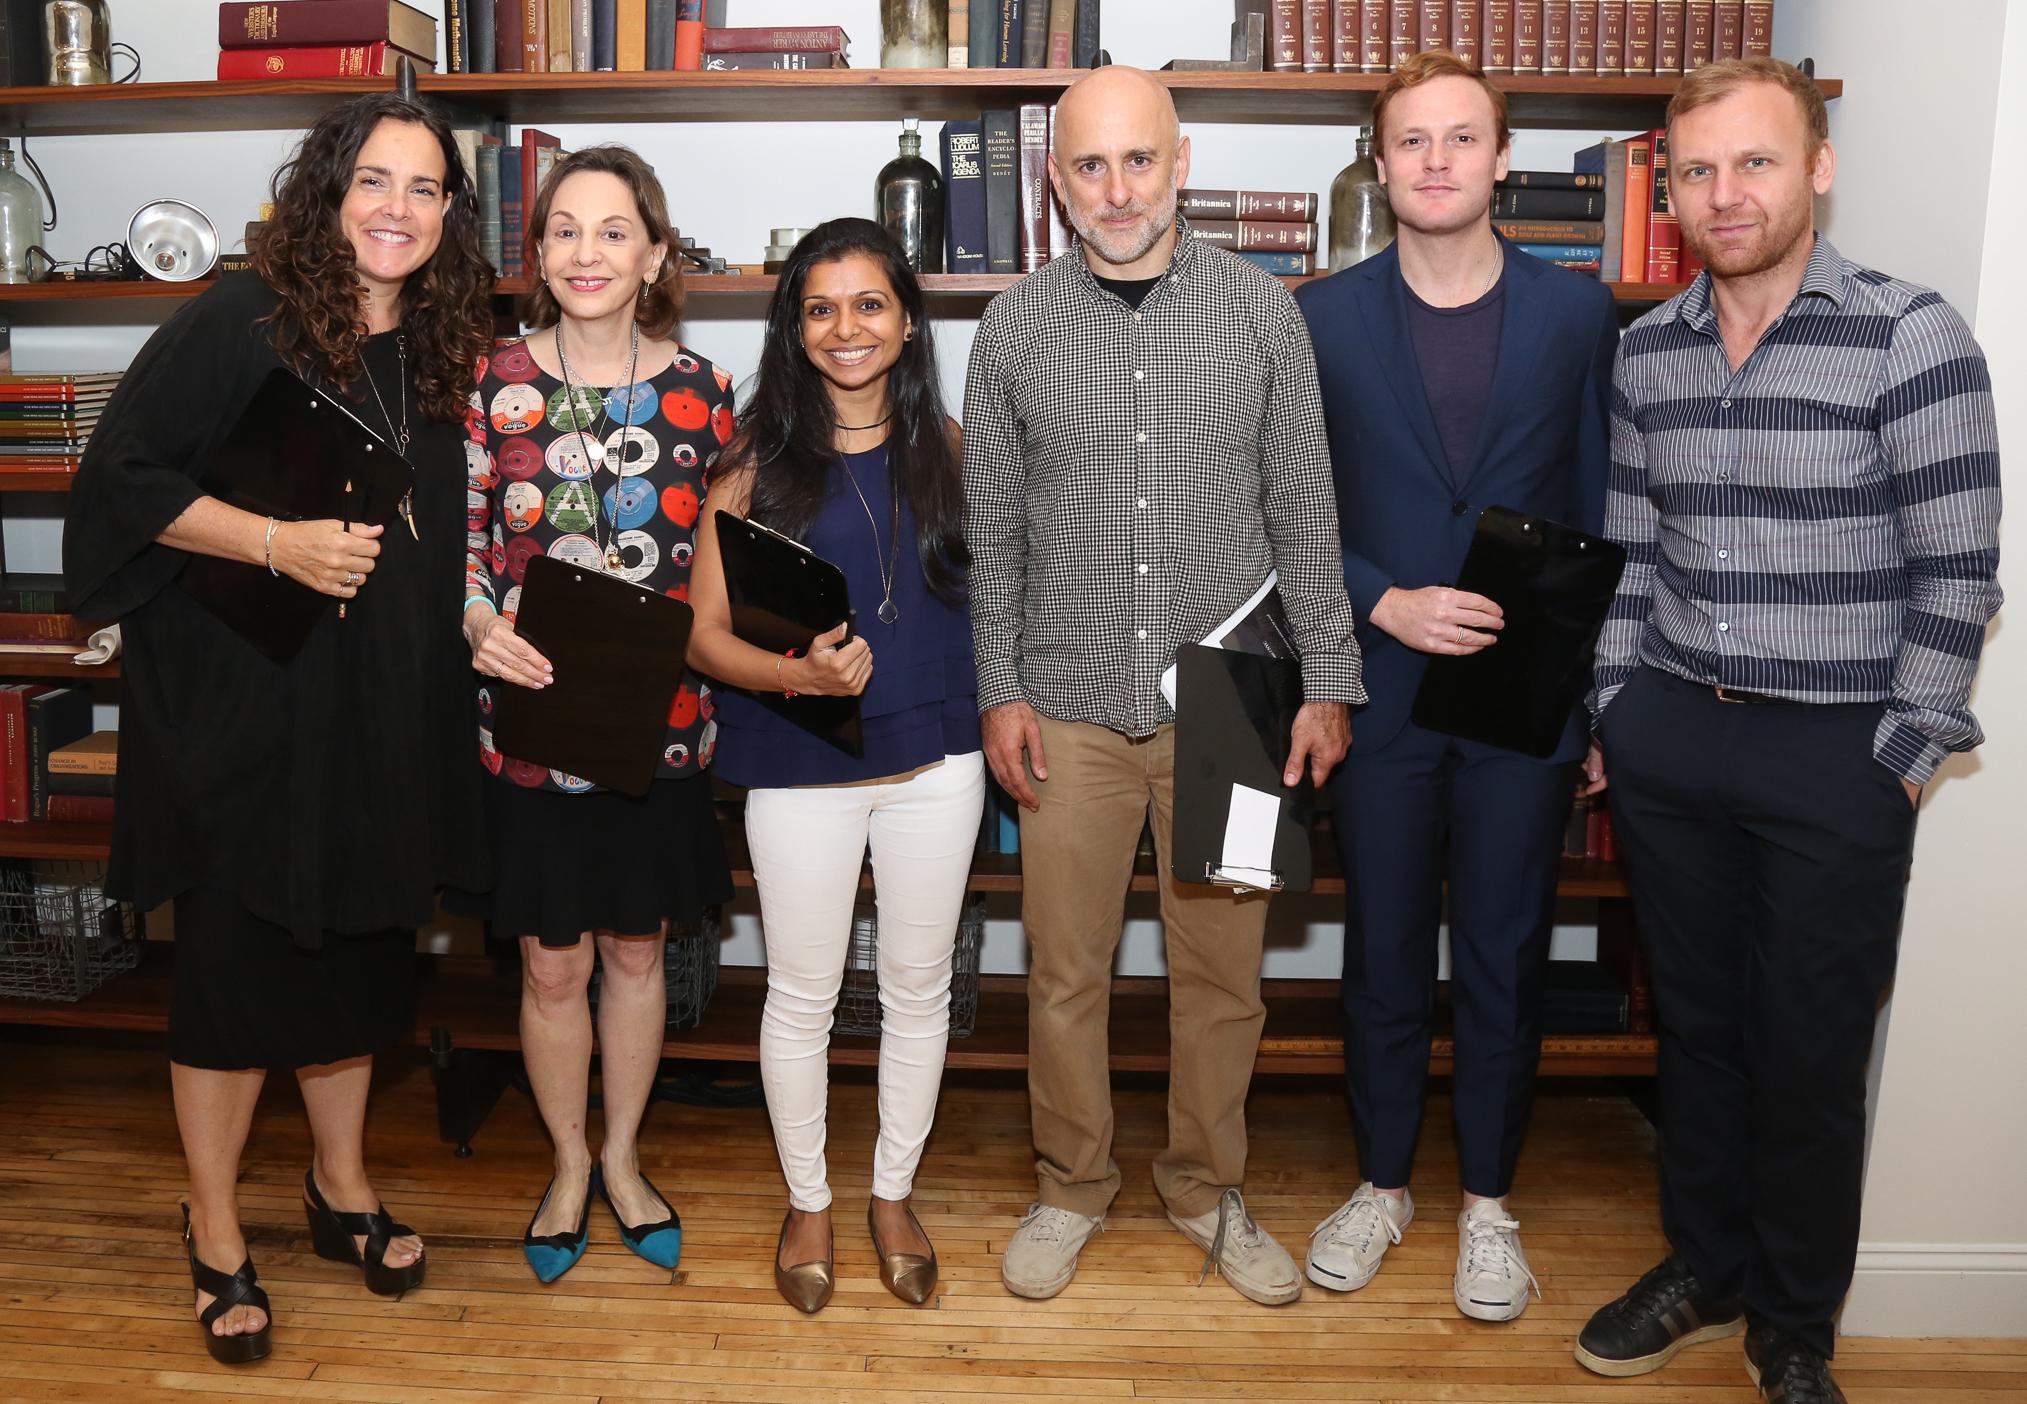 Melissa Joy Manning, Joanne Teichman, Avani Patel, Steven Alan, Will Kahn, Burak Cakmak.jpg